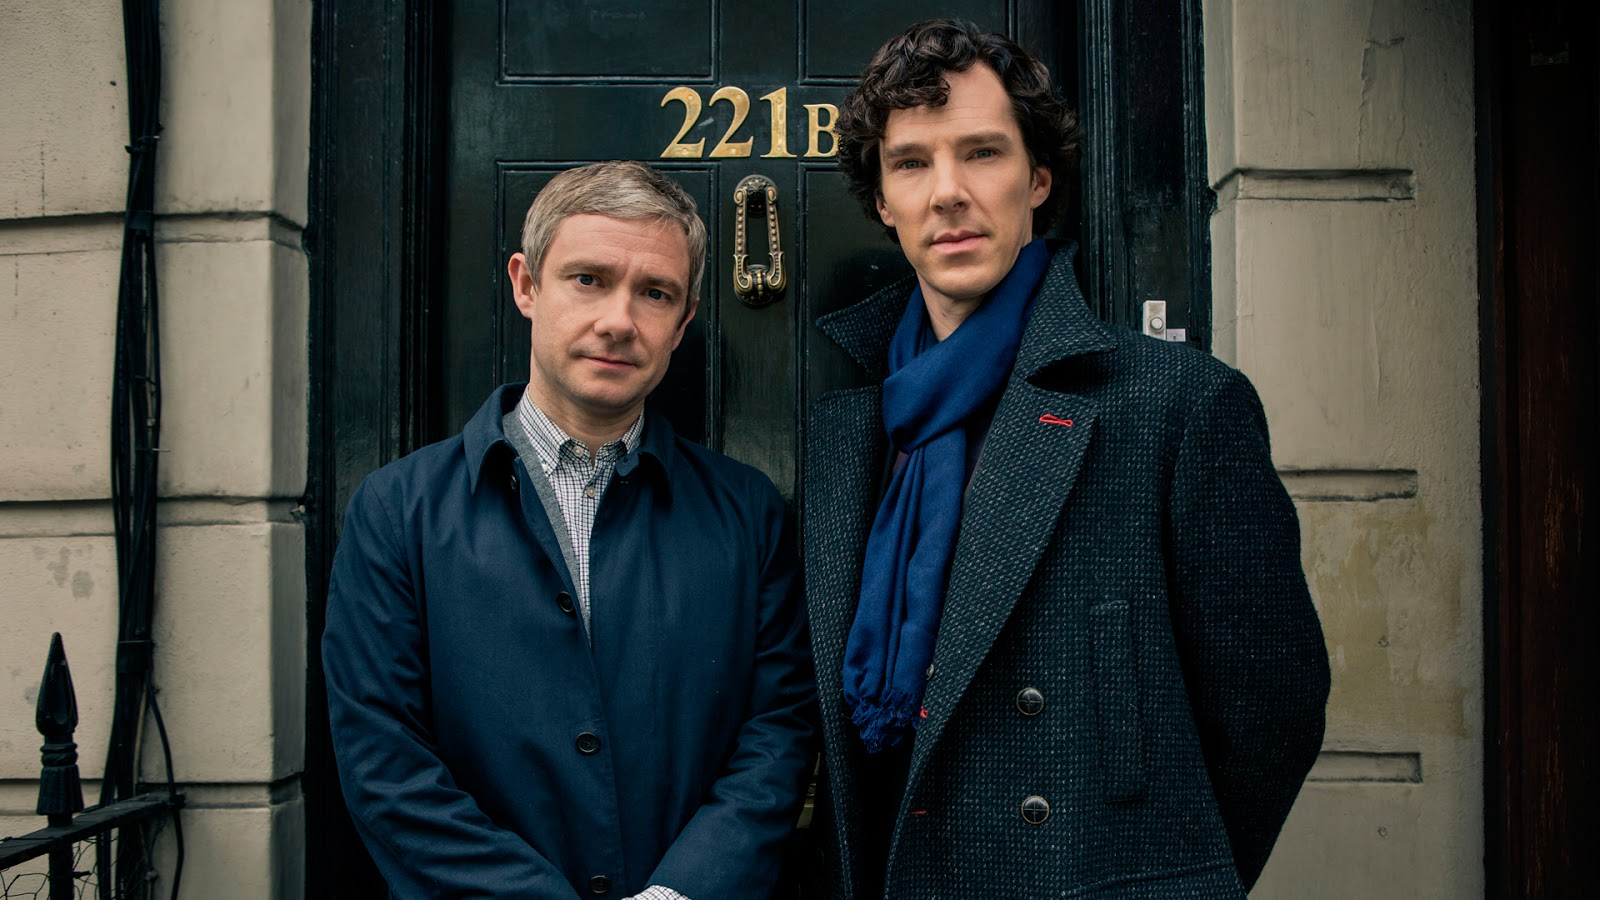 Xem Phim Thám Tử Sherlock 3 - Sherlock Season 3 Full Vietsub | Thuyết Minh HD Online